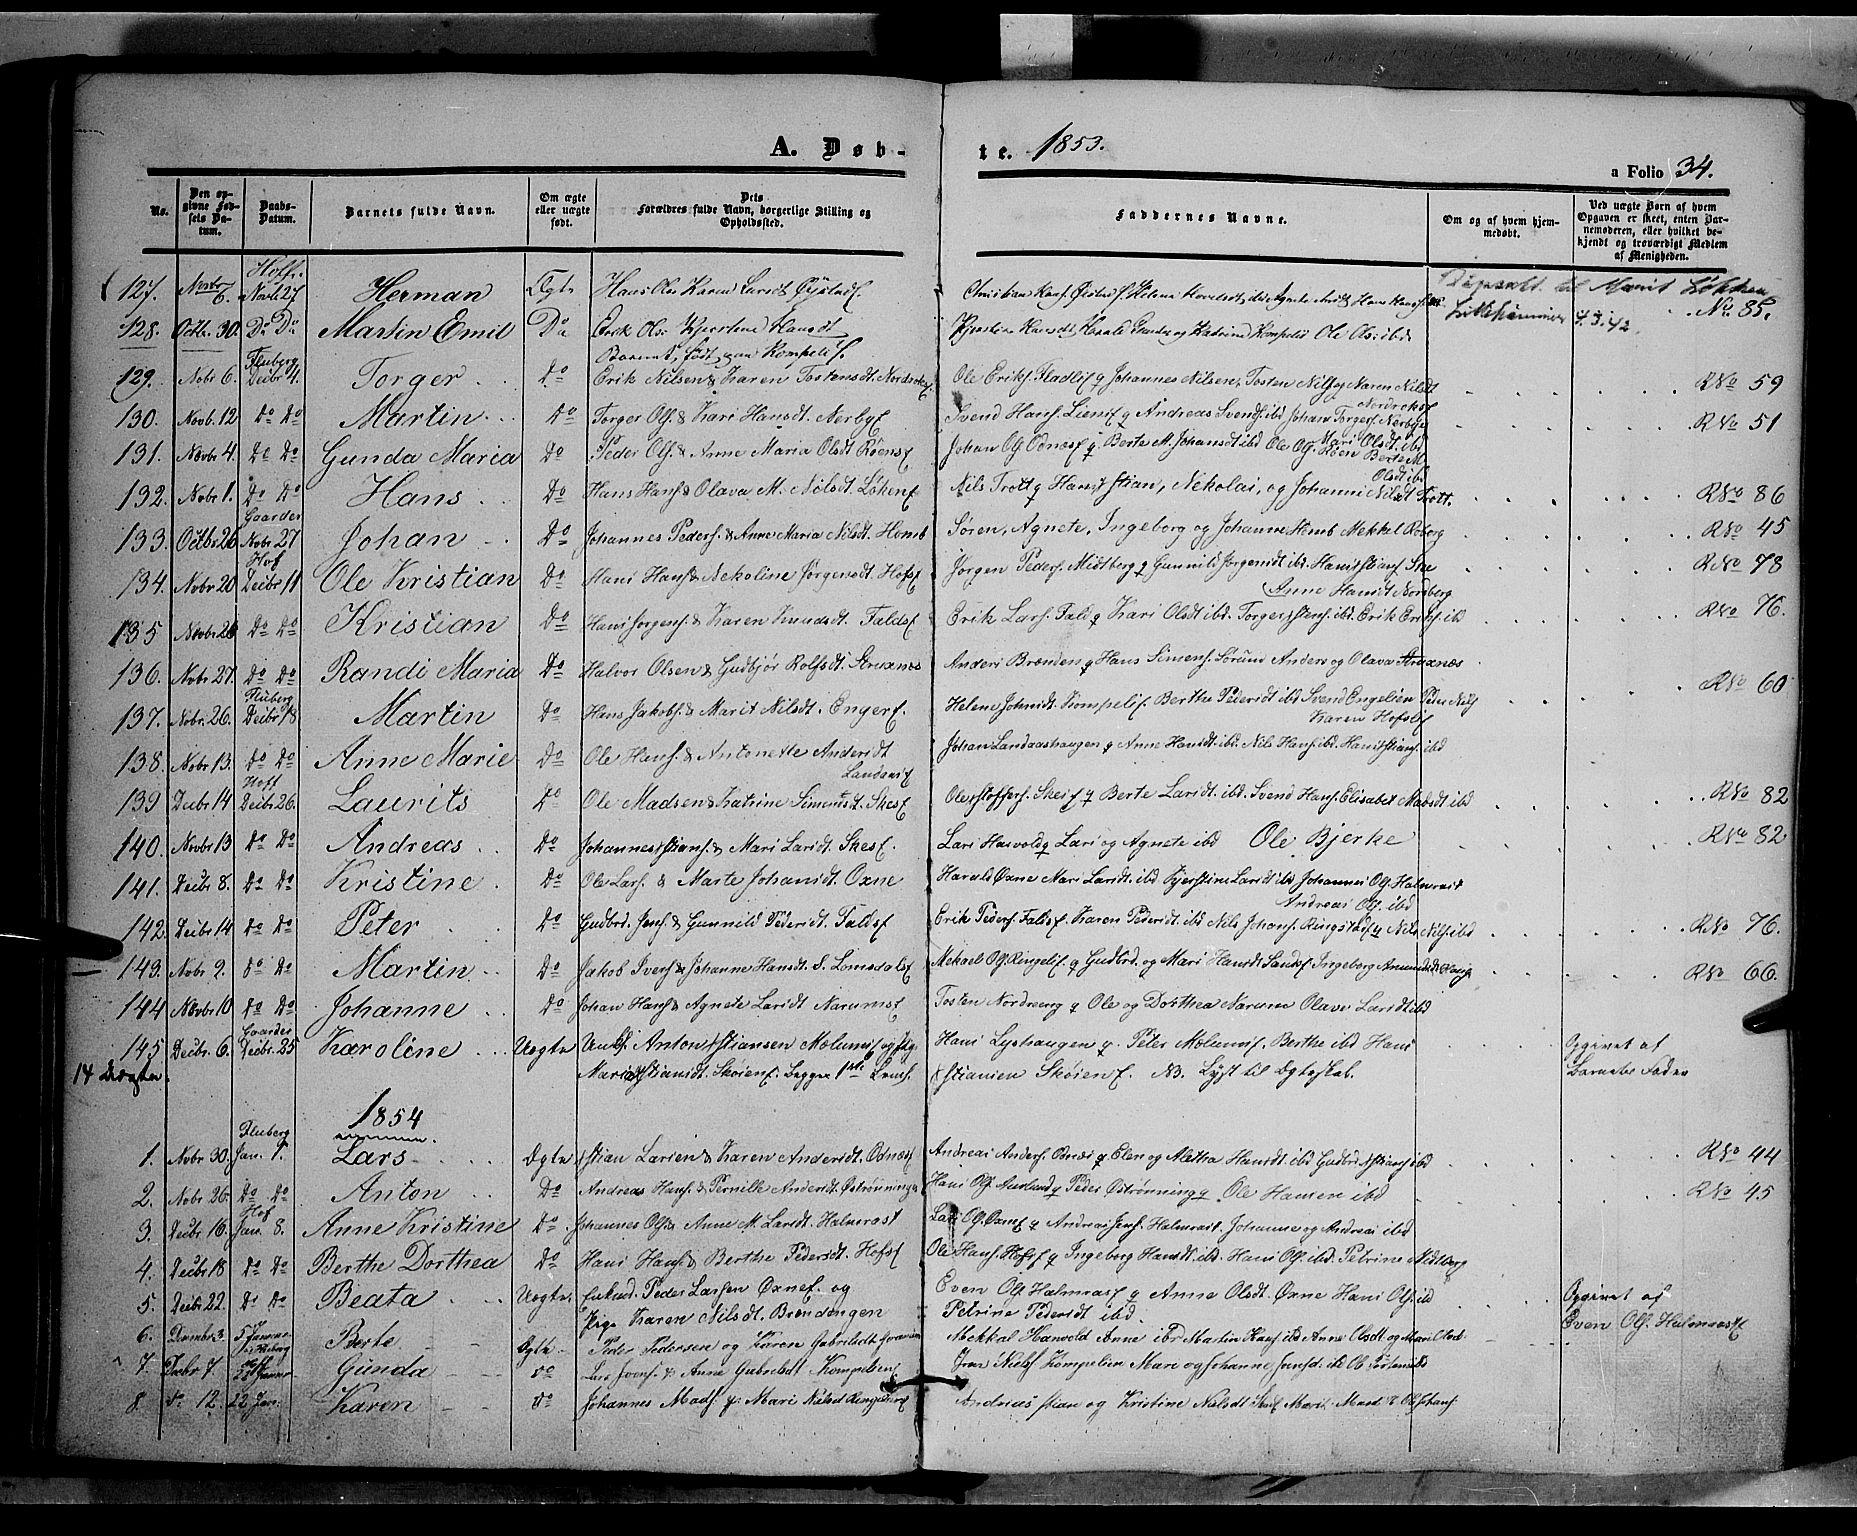 SAH, Land prestekontor, Ministerialbok nr. 9, 1847-1859, s. 34